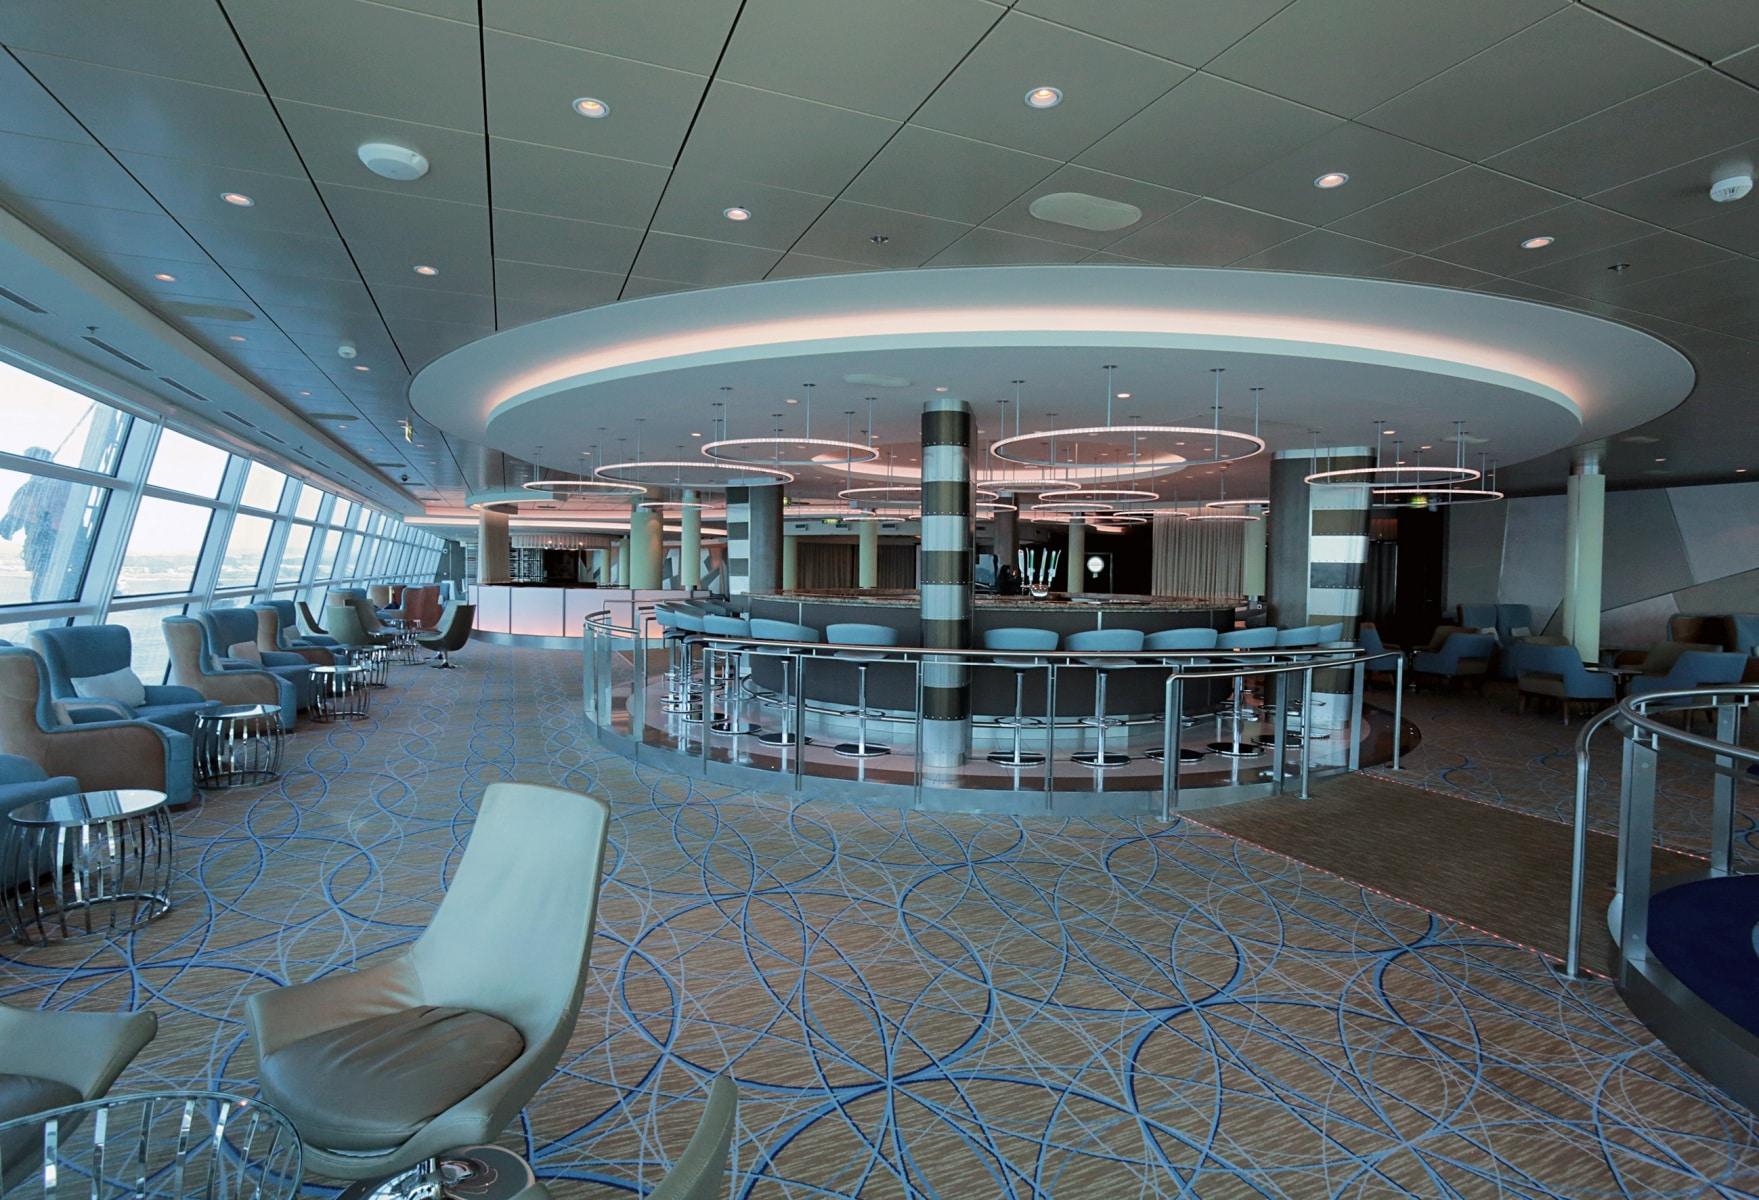 Escala-inaugural-del-crucero-Ovation-of-the-Seas-15